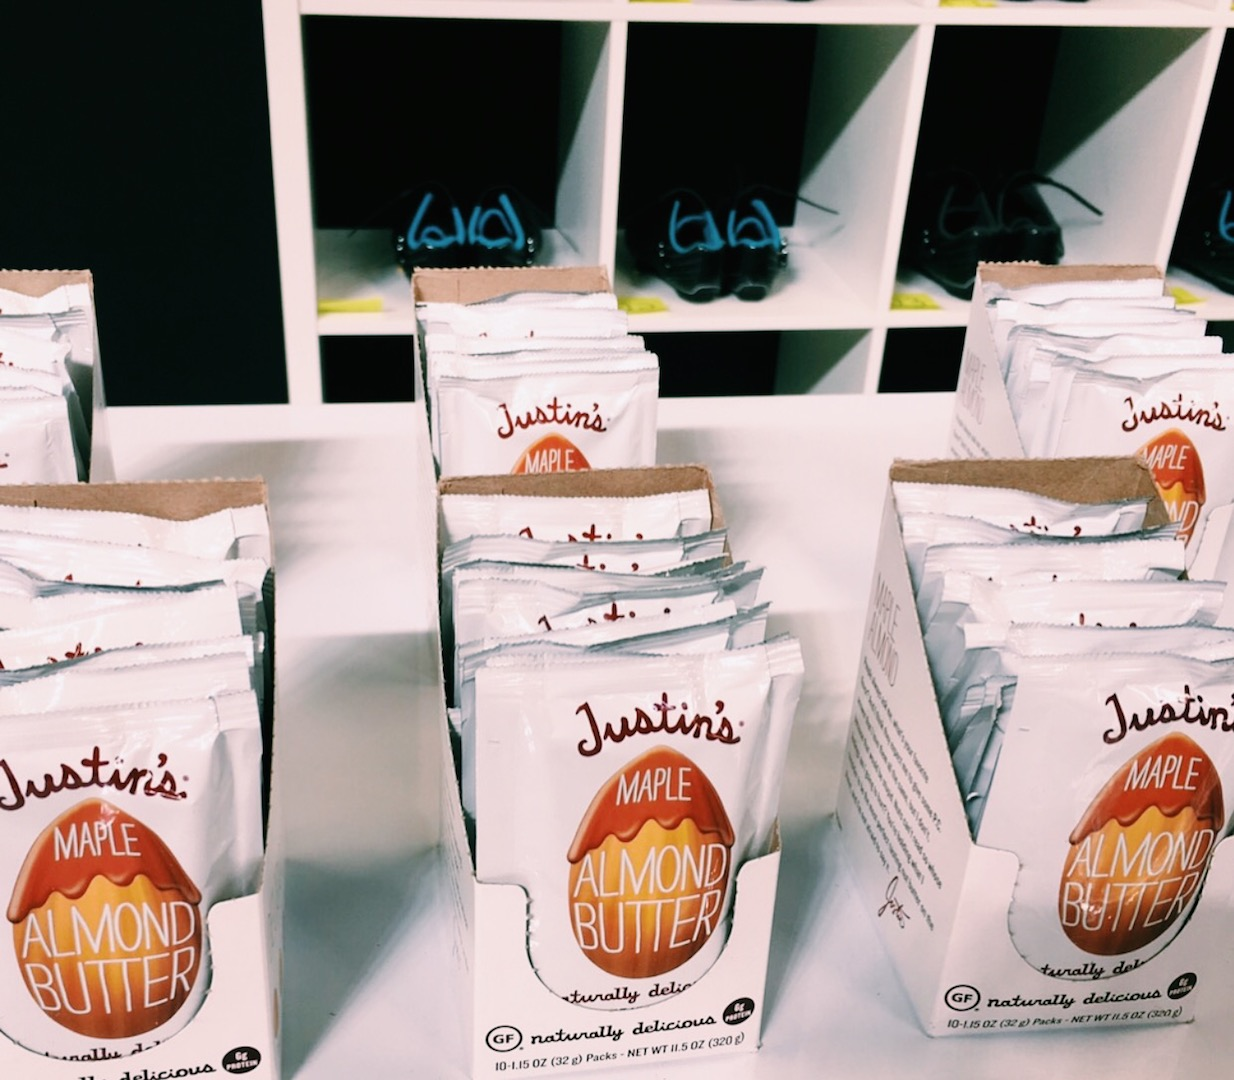 justin's-almond-butter-dtla-fitness-event.JPG